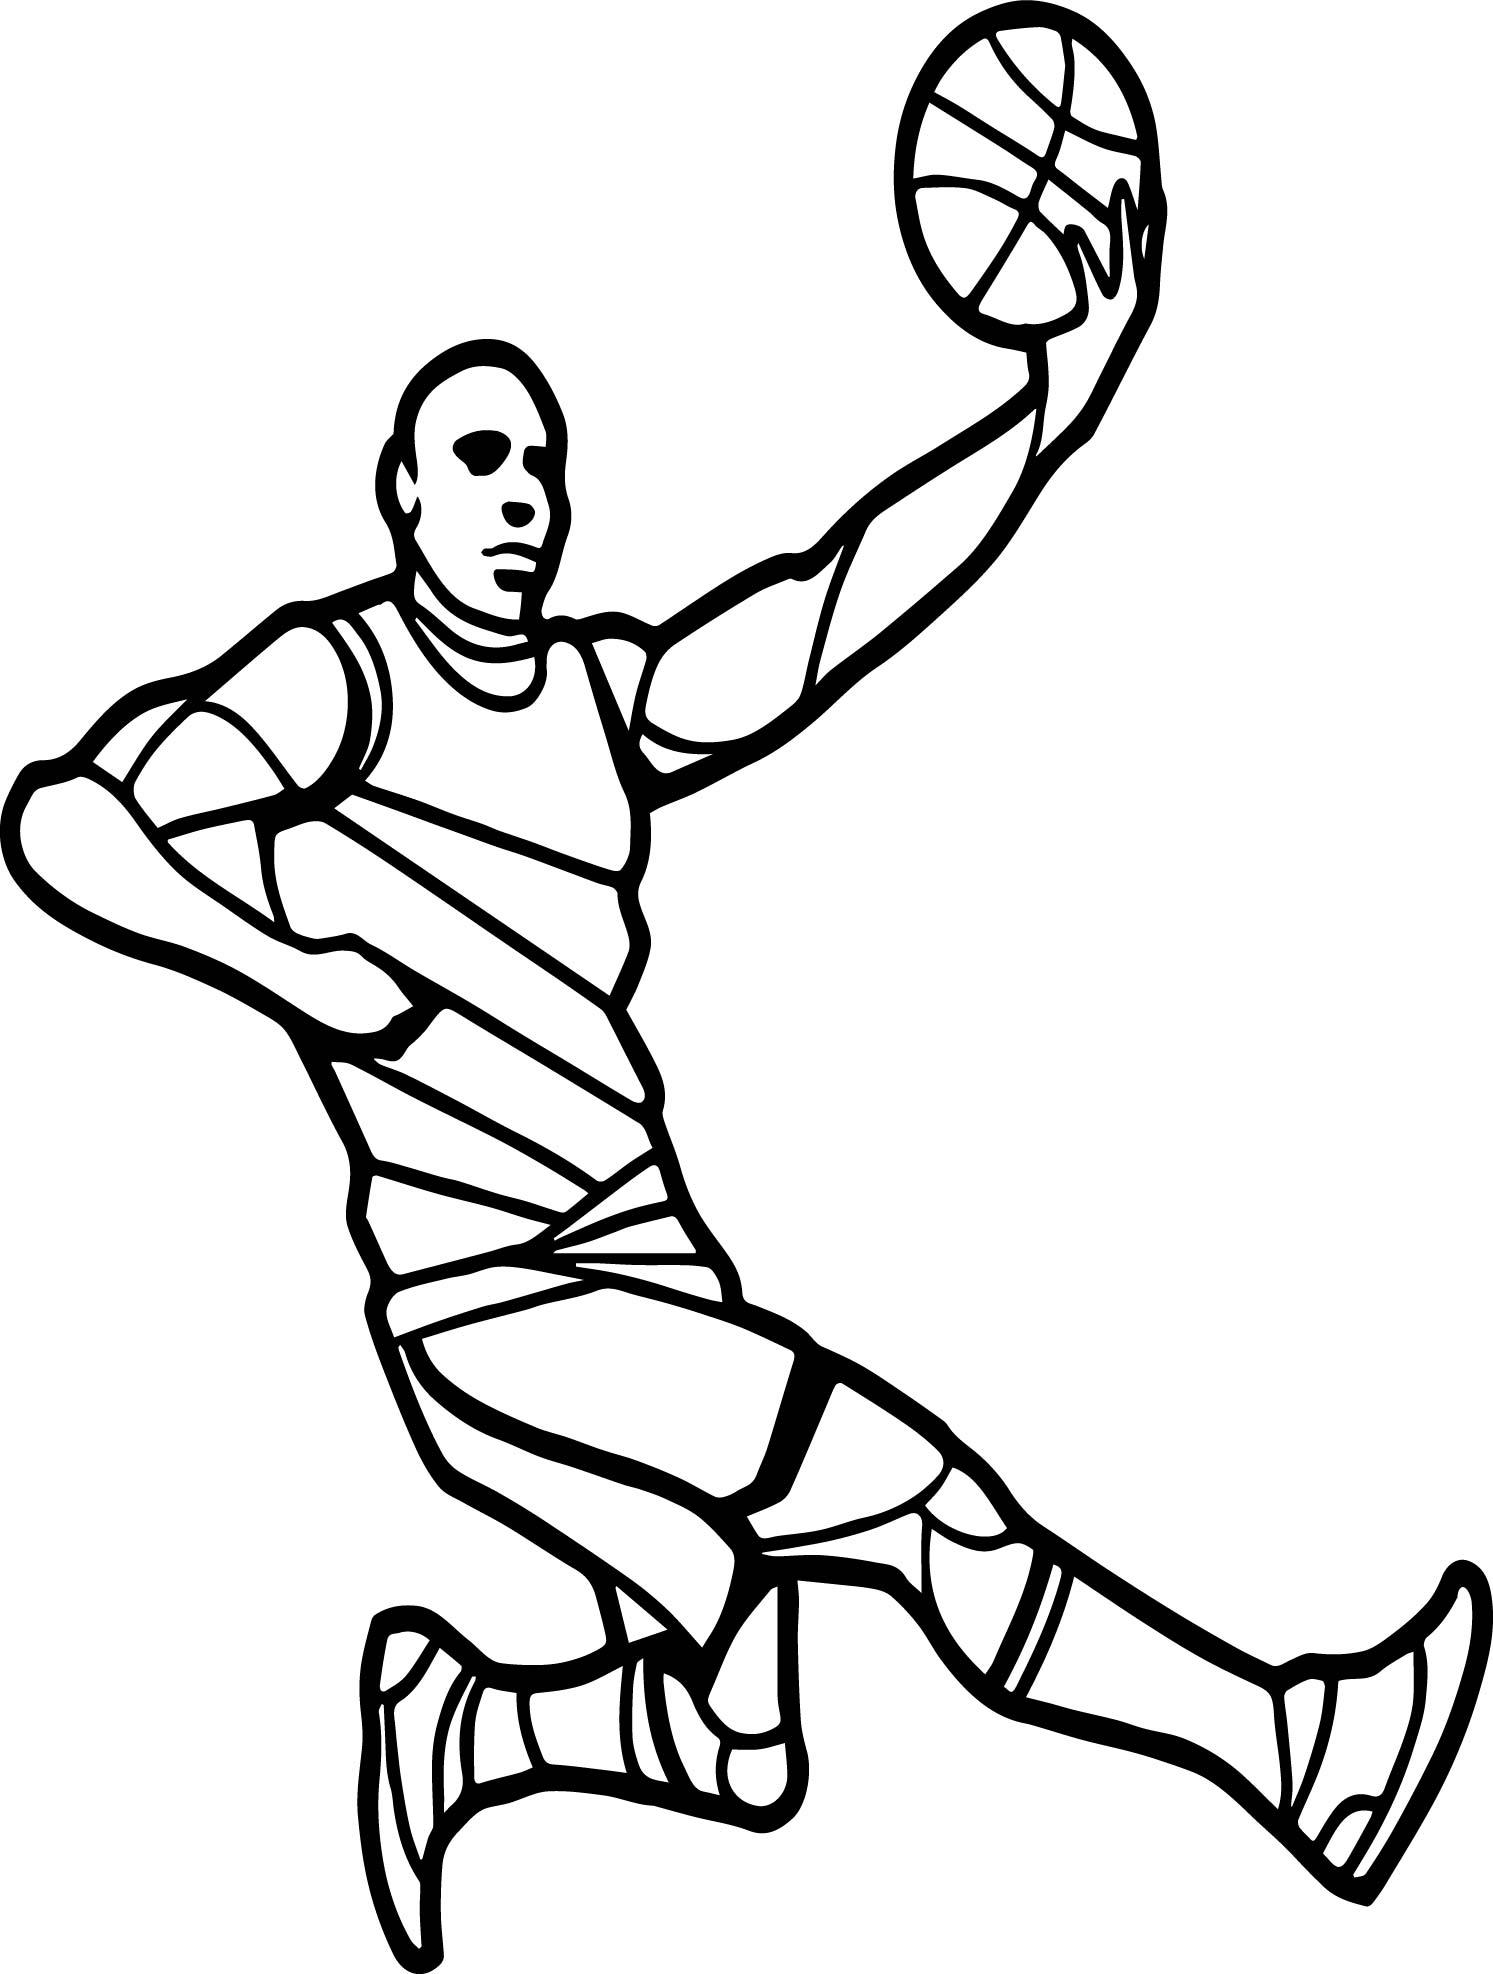 Basketball Player Playing Basketball Flip Shoot Coloring Page